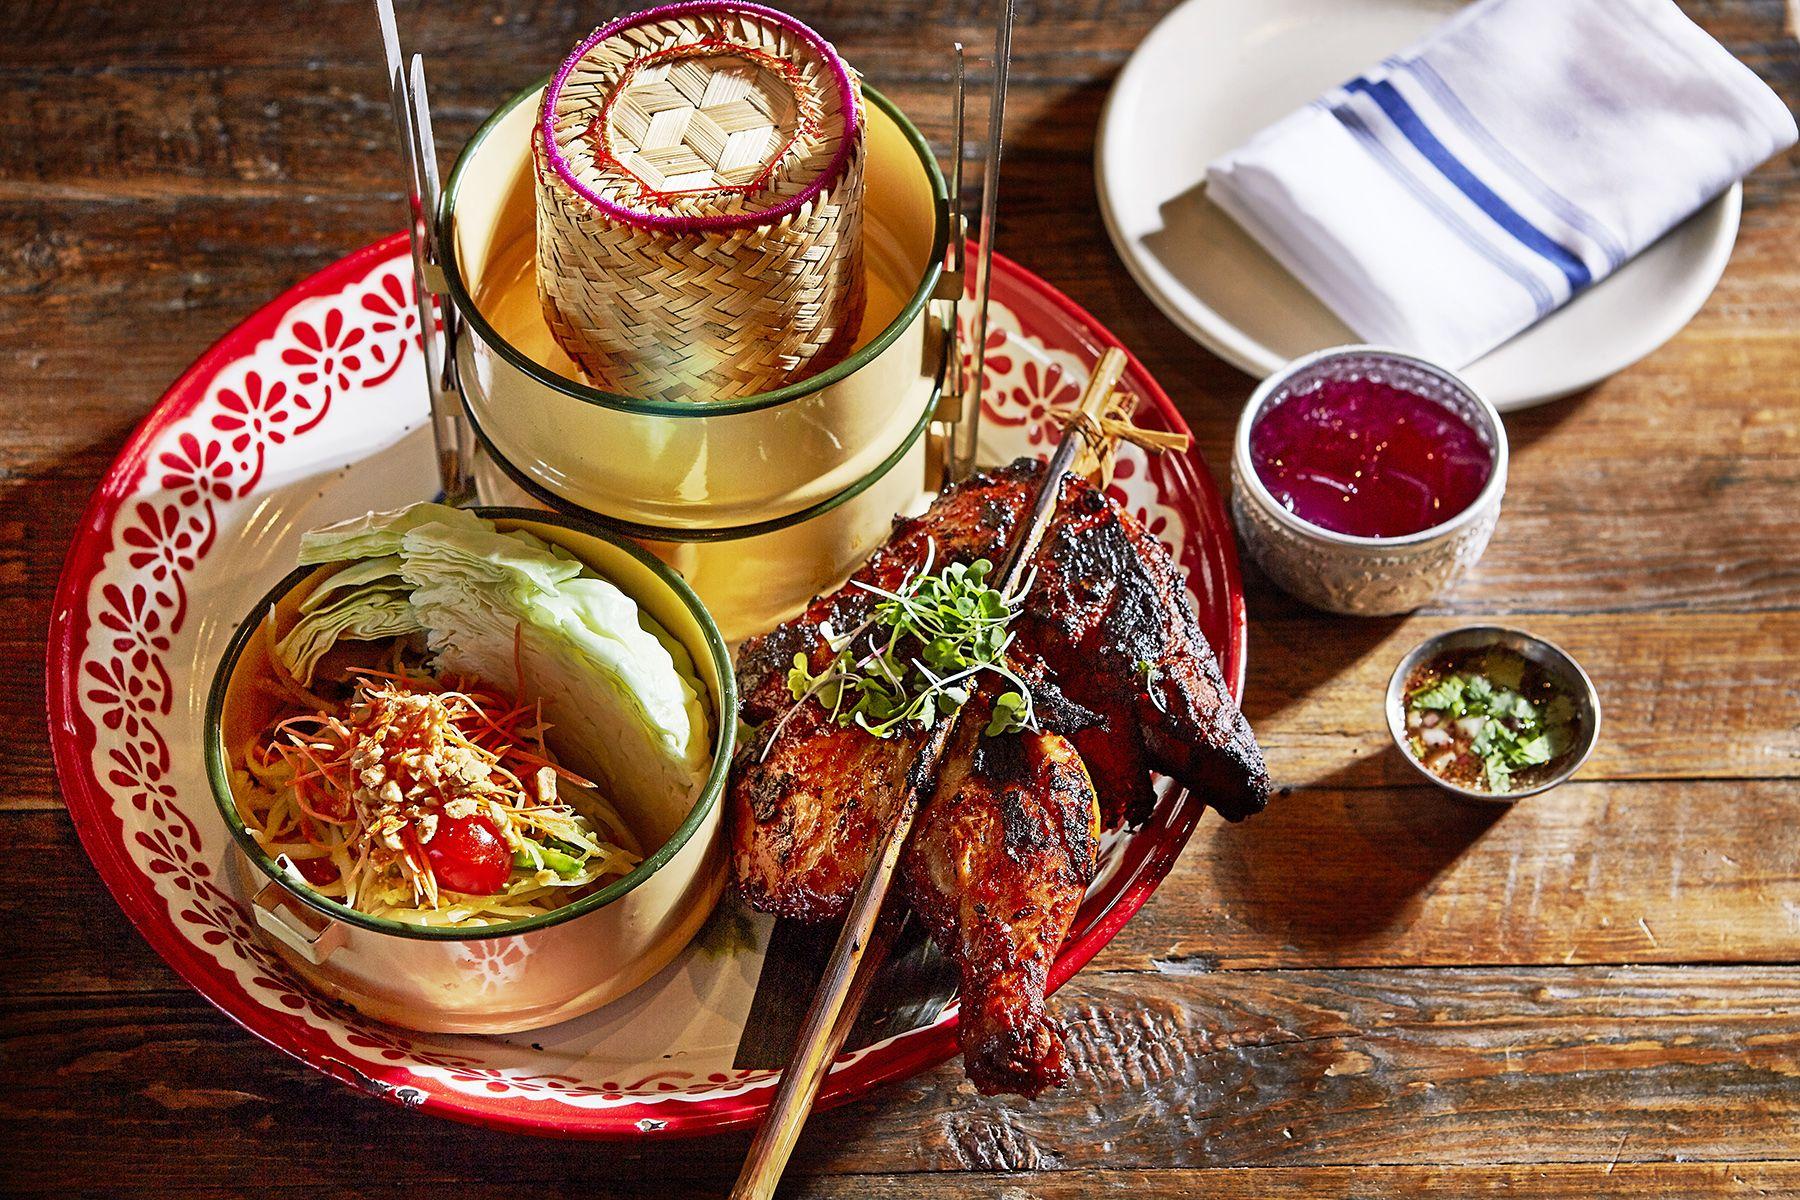 Farmhouse Kitchen Thai Cuisine The Best Thai Food in